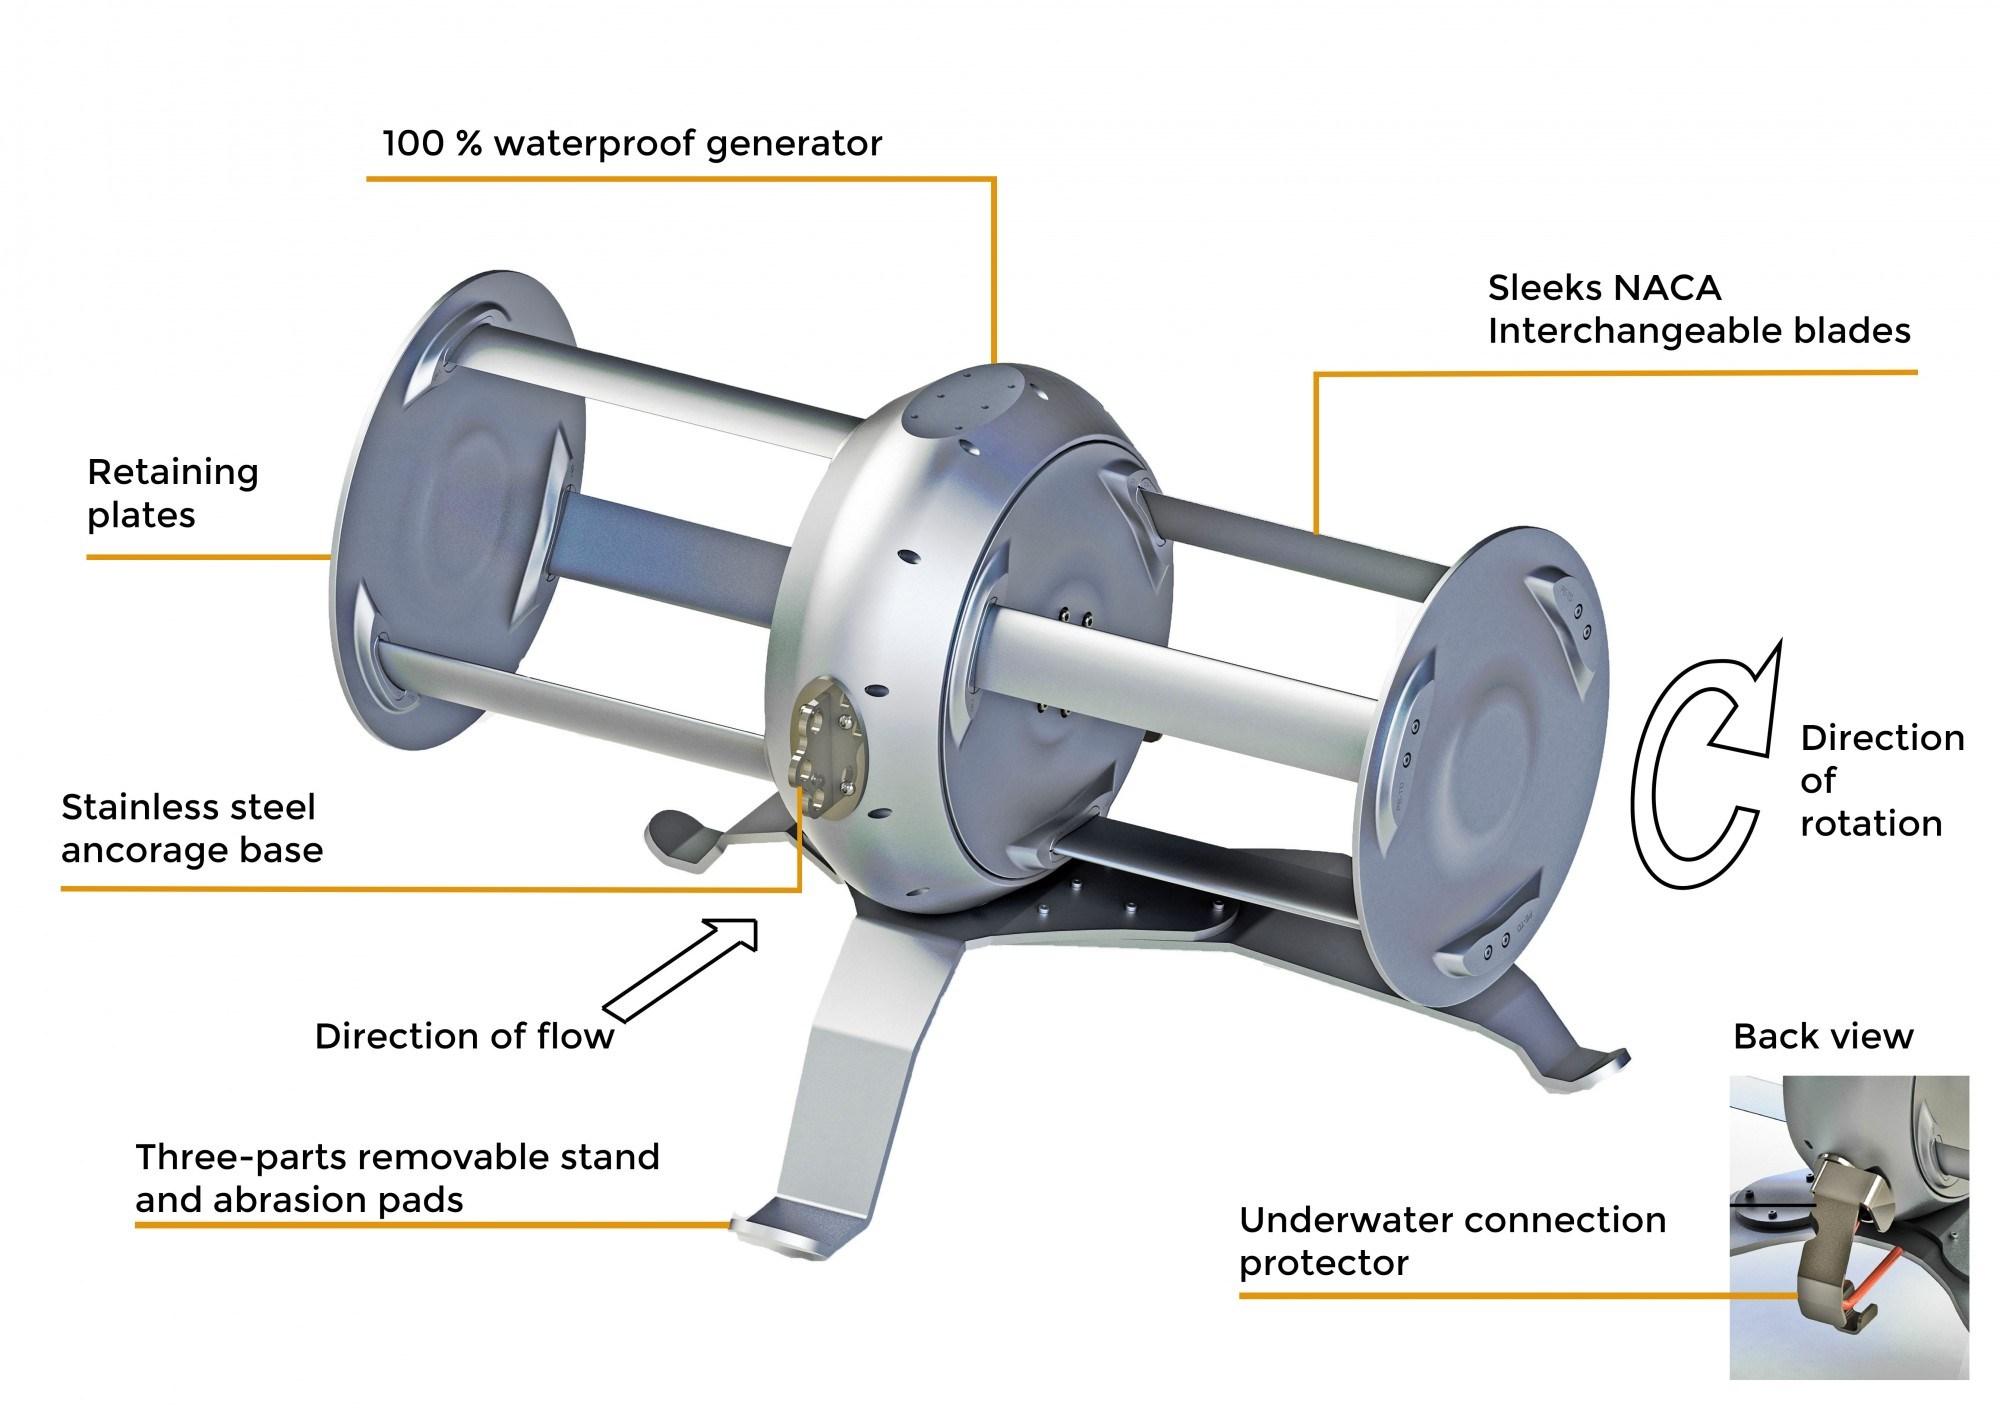 idenergine-turbine